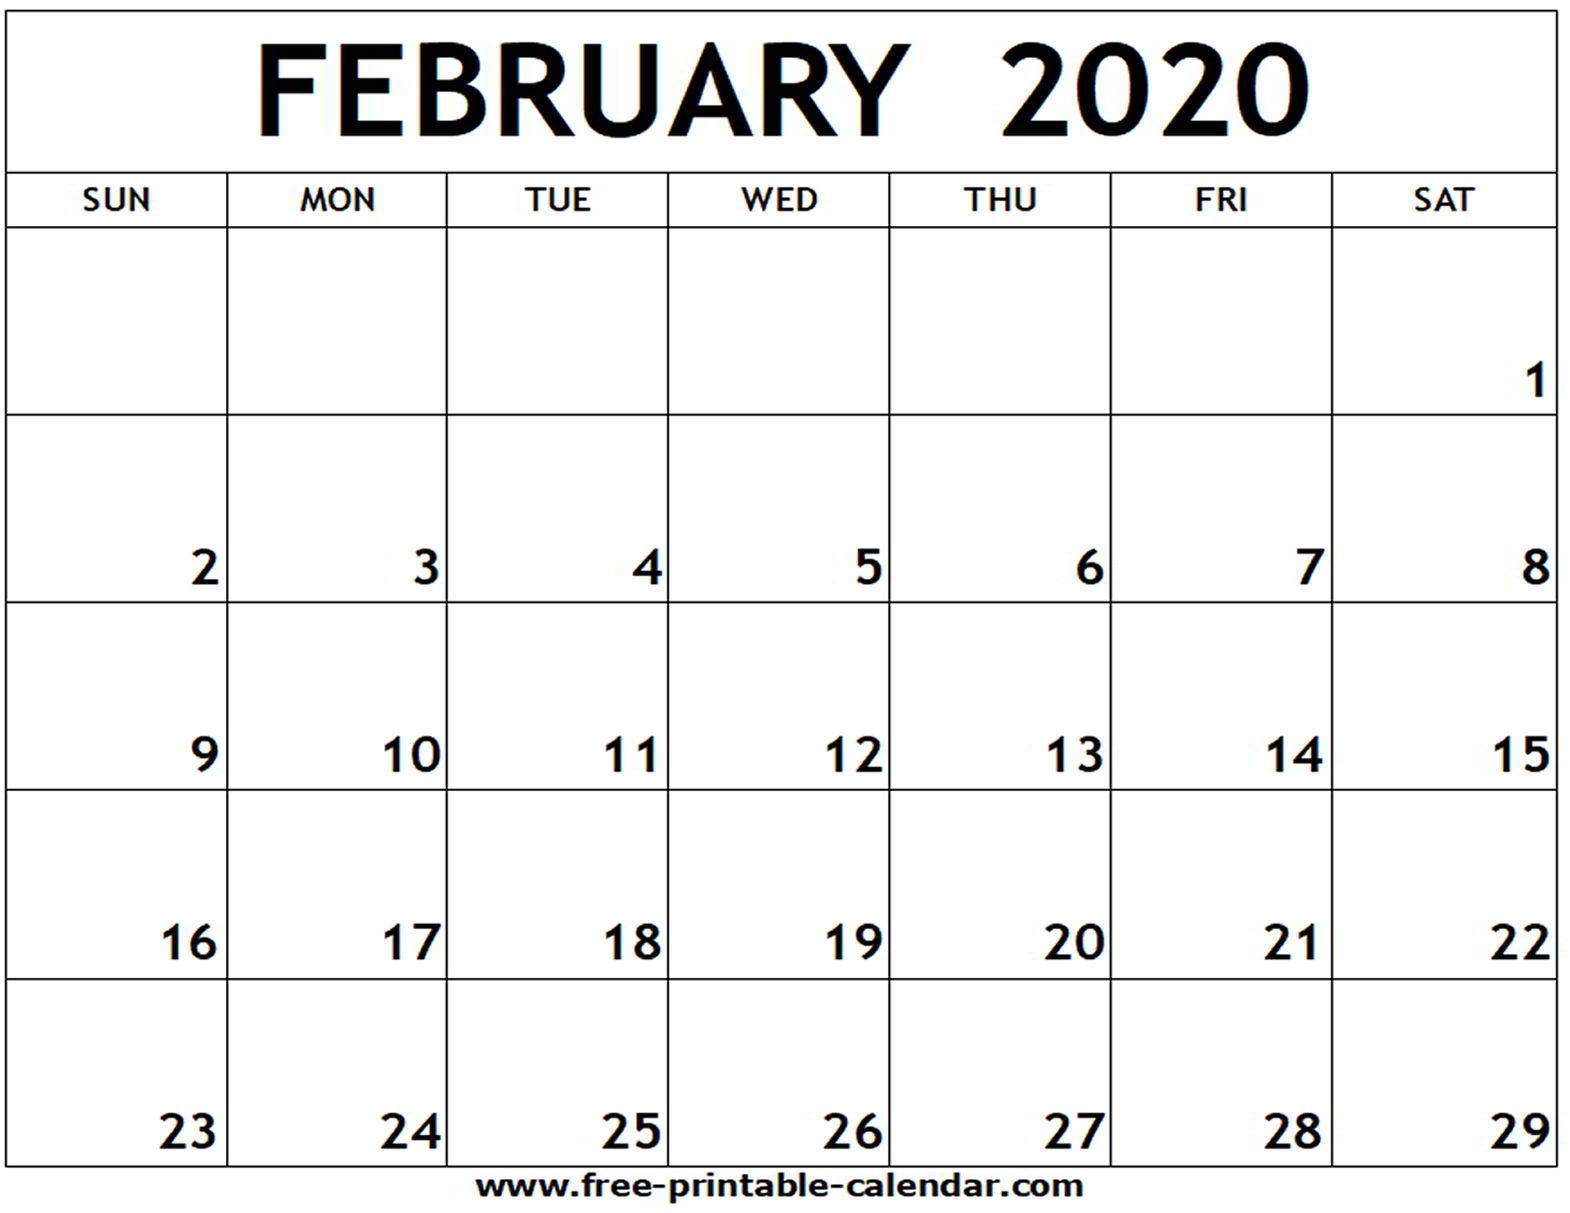 Monthly Calendar February 2020 Printable  Bolan intended for Monthly Calendar 2020 Printable